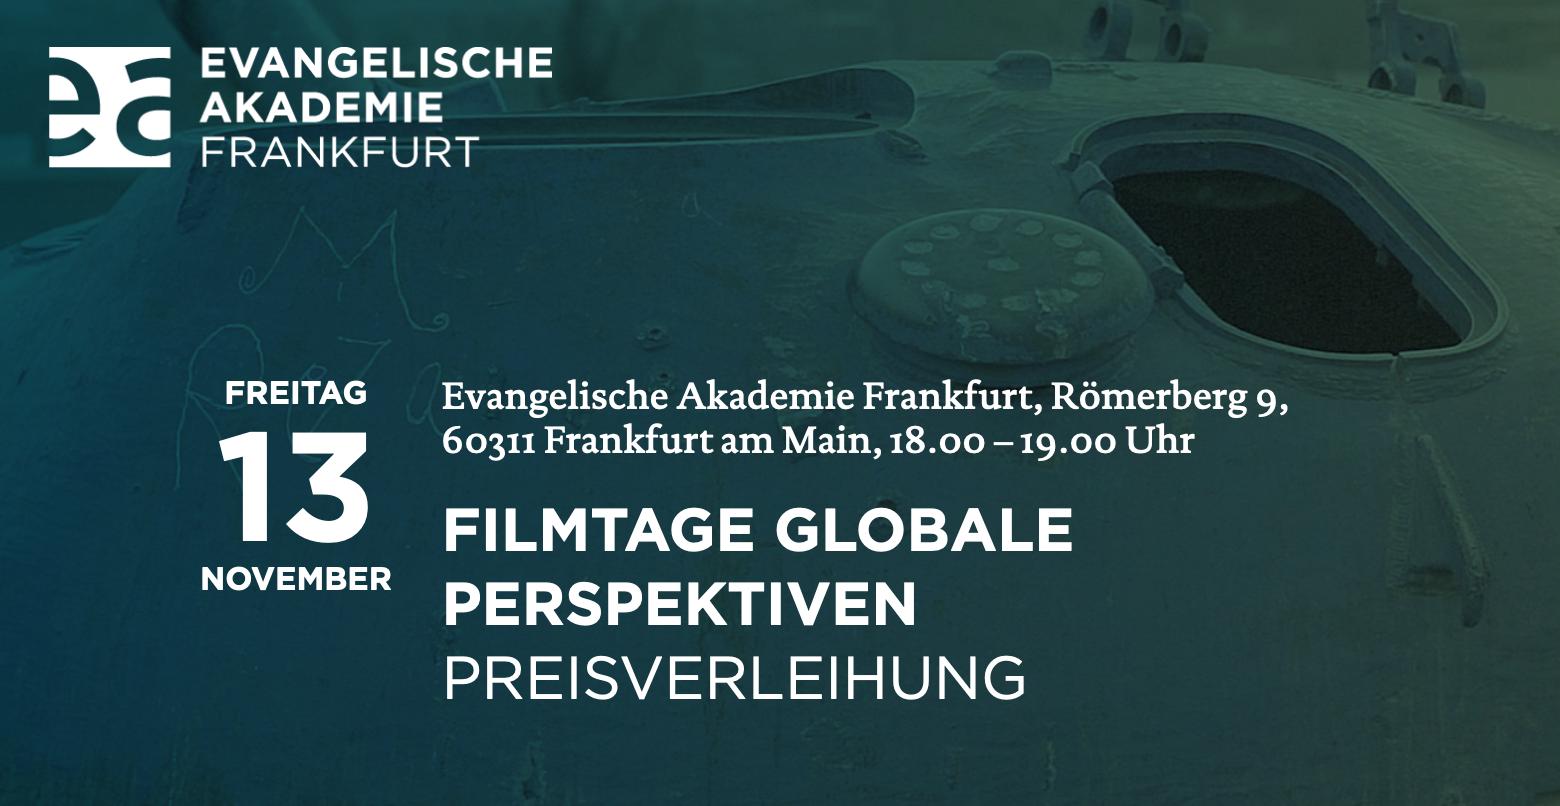 Screenshot_2020-09-02 FILMTAGE GLOBALE PERSPEKTIVEN - Kalender - Evangelische Akademie Frankfurt